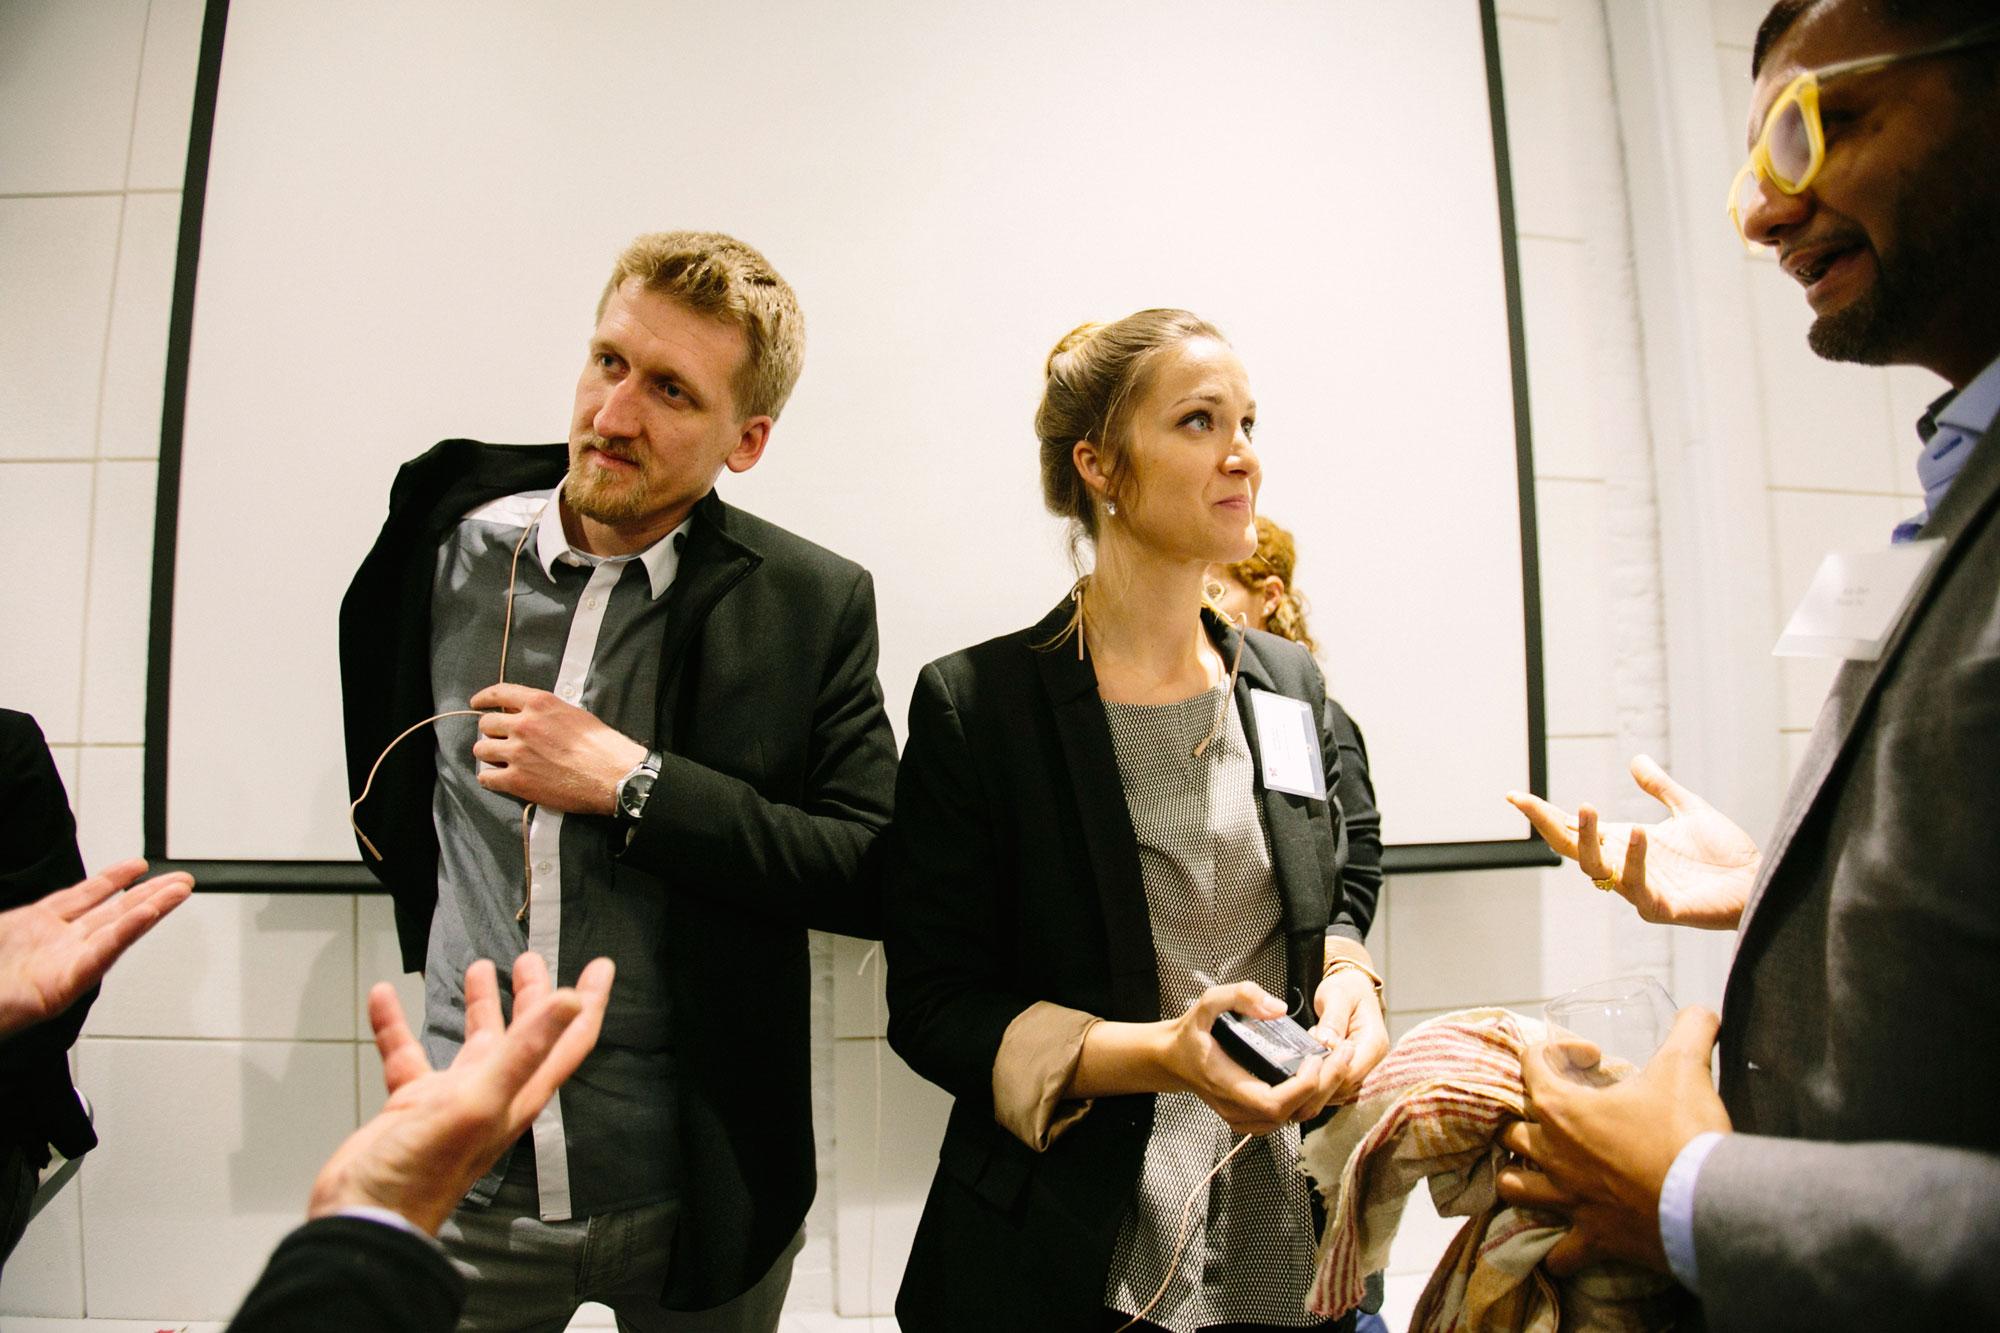 Felix Heisel and Marta H. Wisniewska at swissnex SF